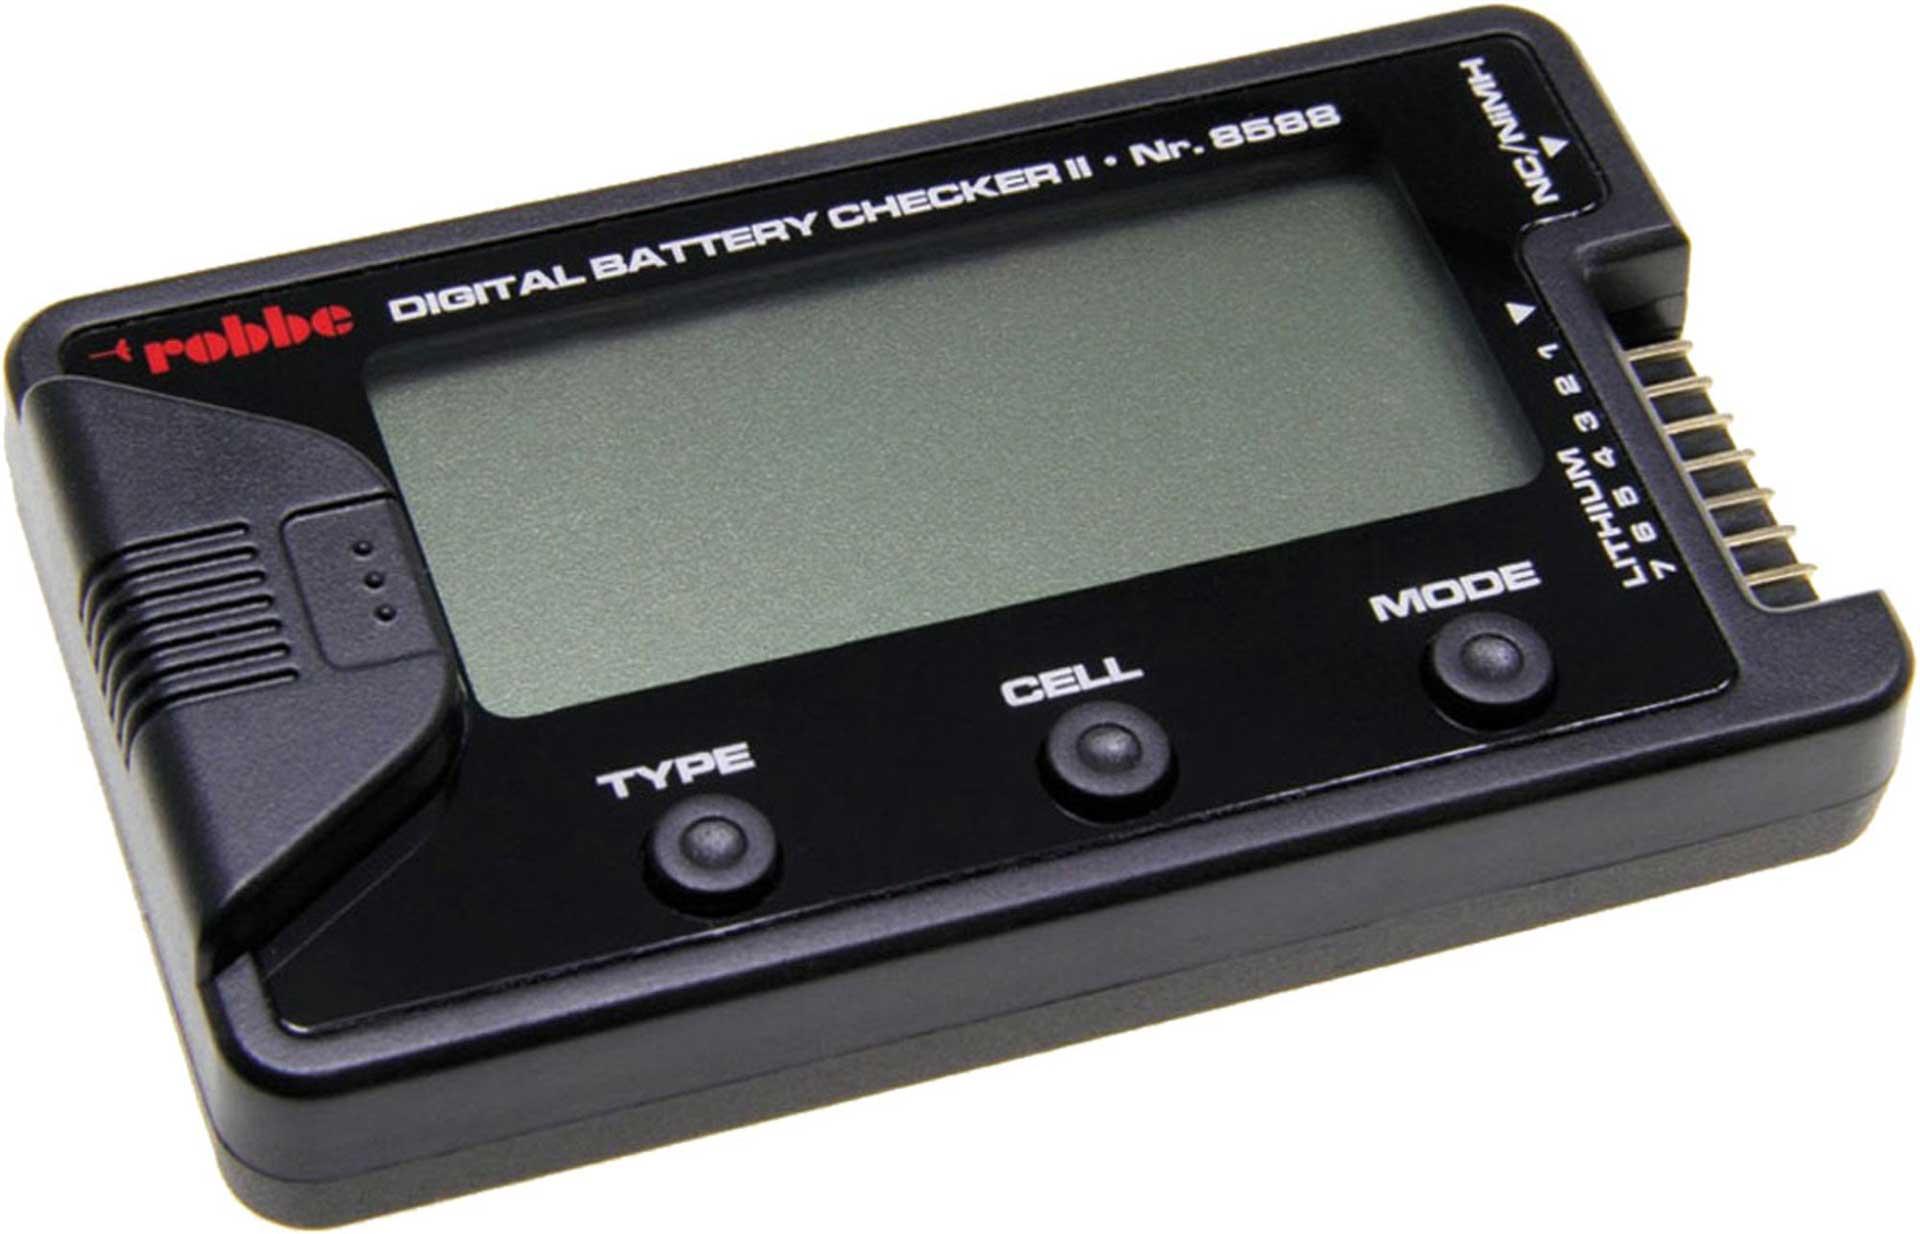 Robbe Modellsport Digital Battery Checker II